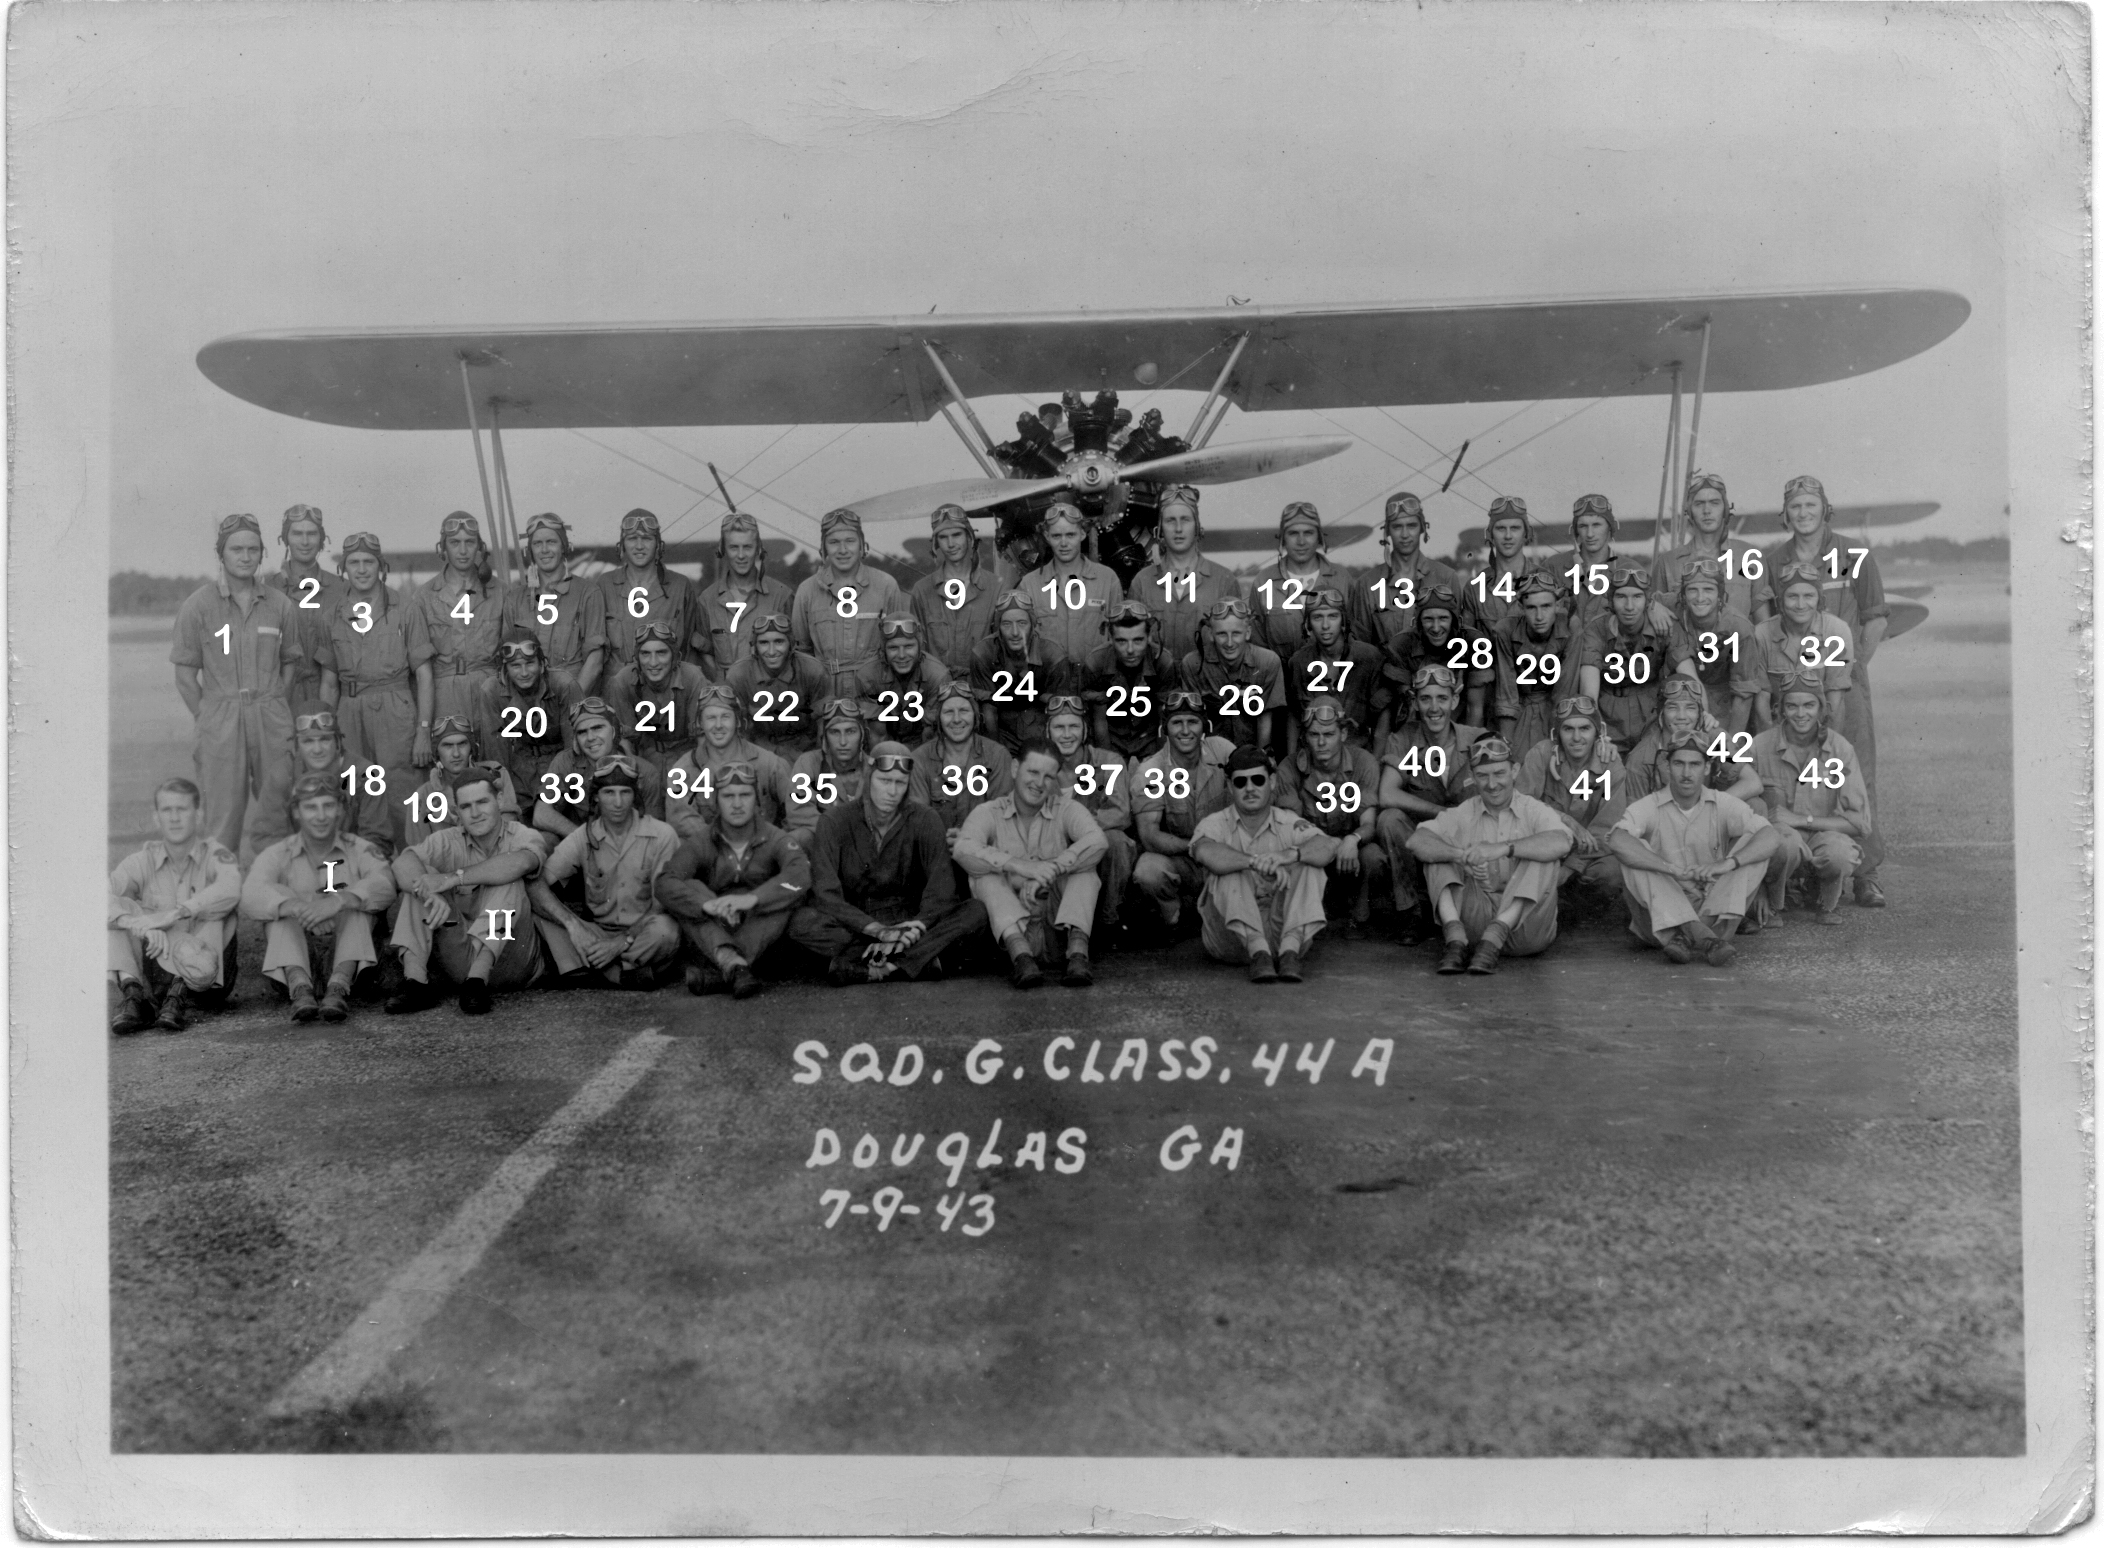 Squadron G picture